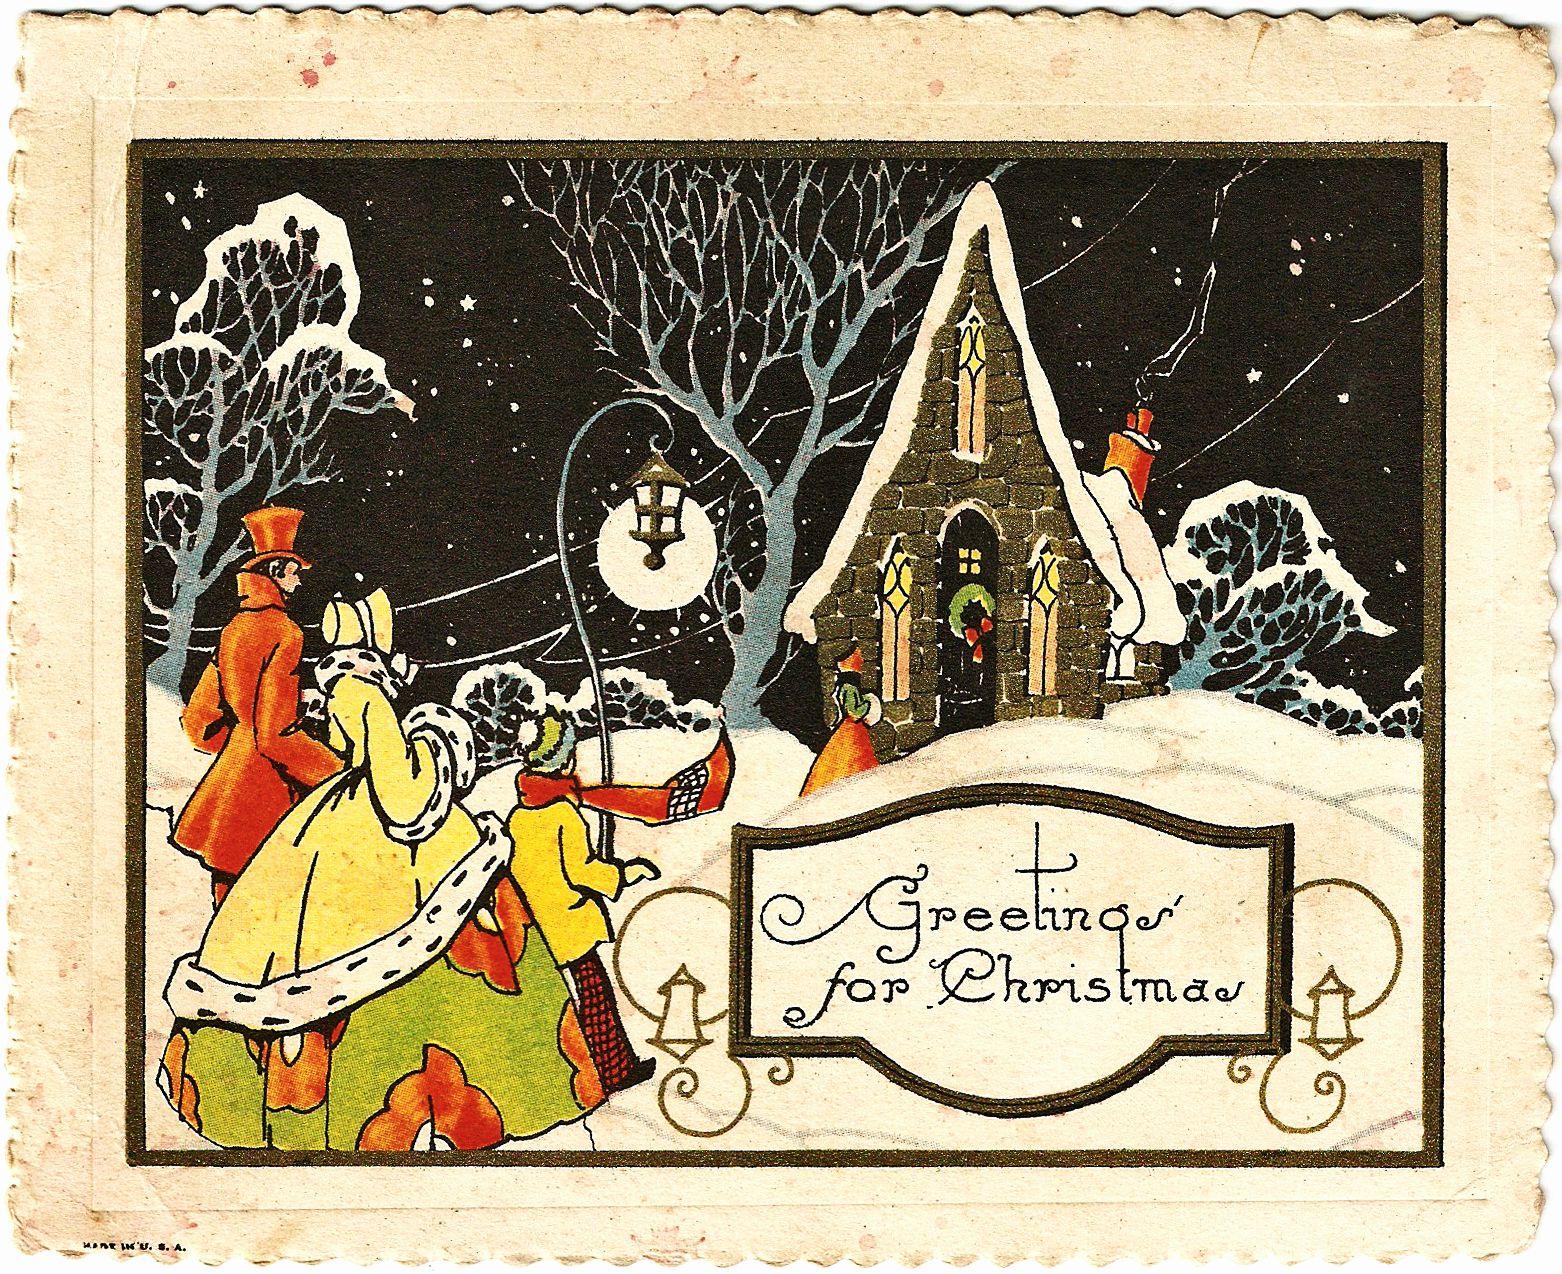 Catnipstudiocollage Free Vintage Clip Art Starry Night Christmas